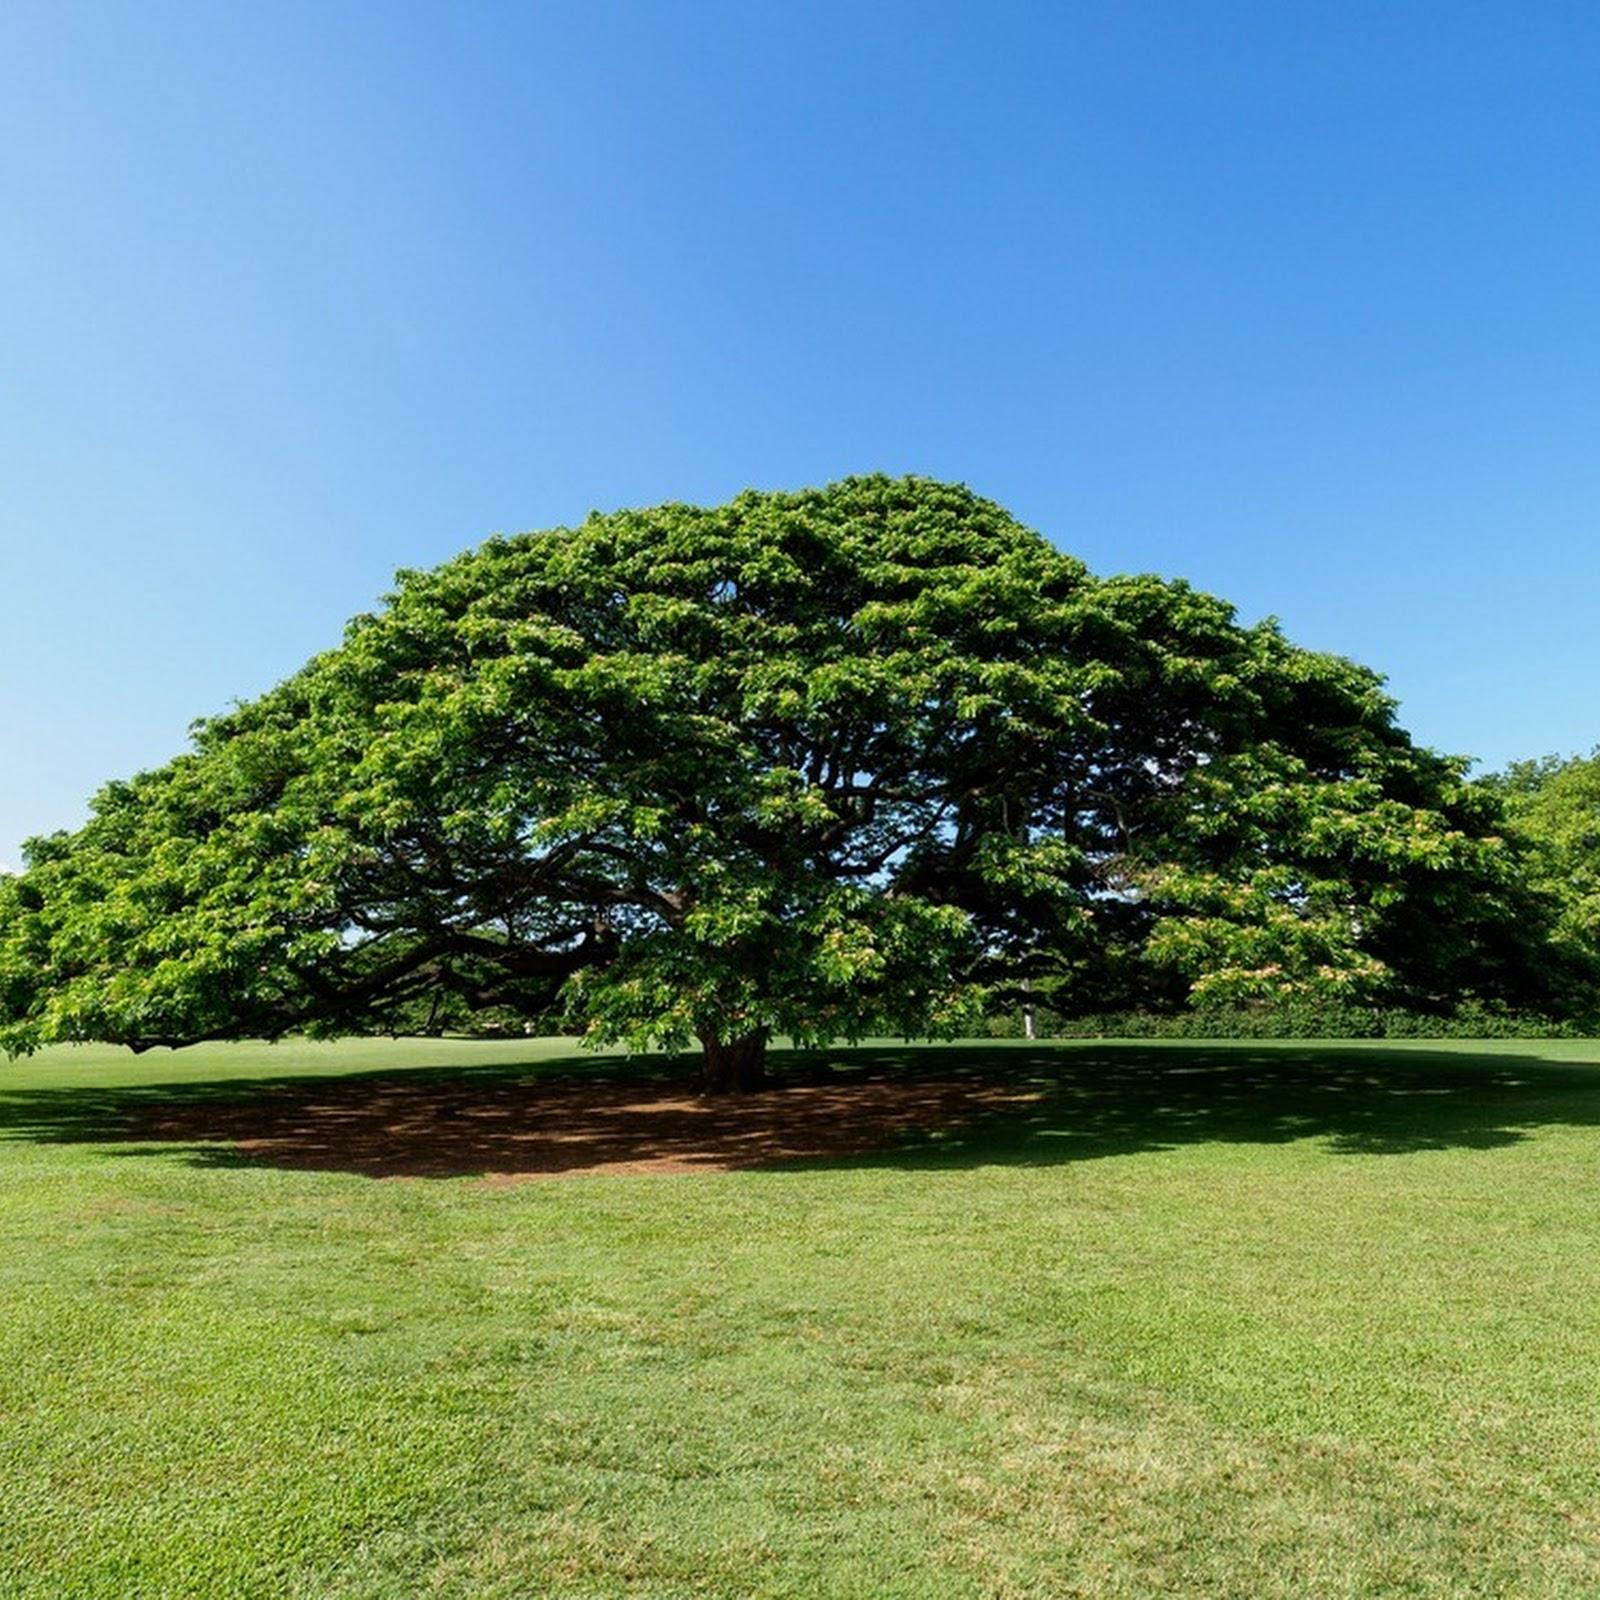 The Hitachi Tree of Moanalua Gardens